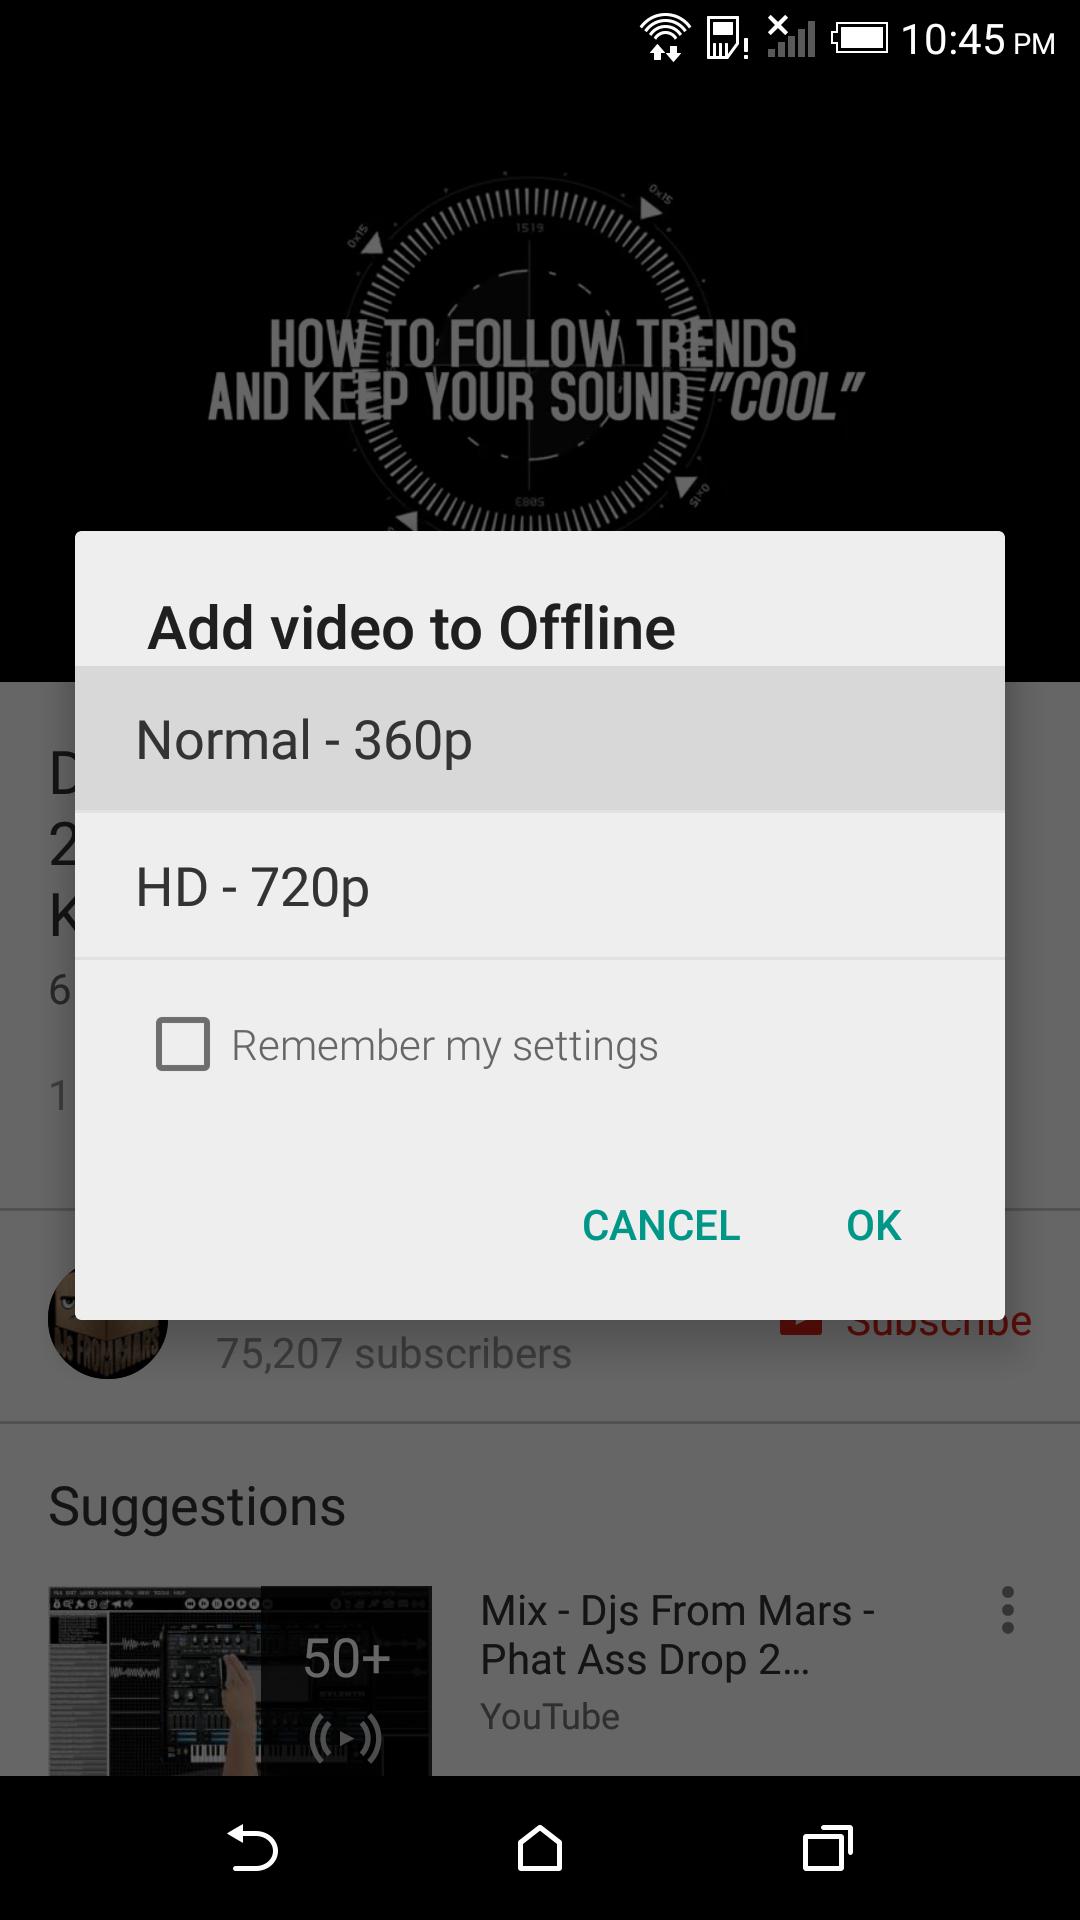 YouTube v10 28 Improves Offline Download Dialog With 144p